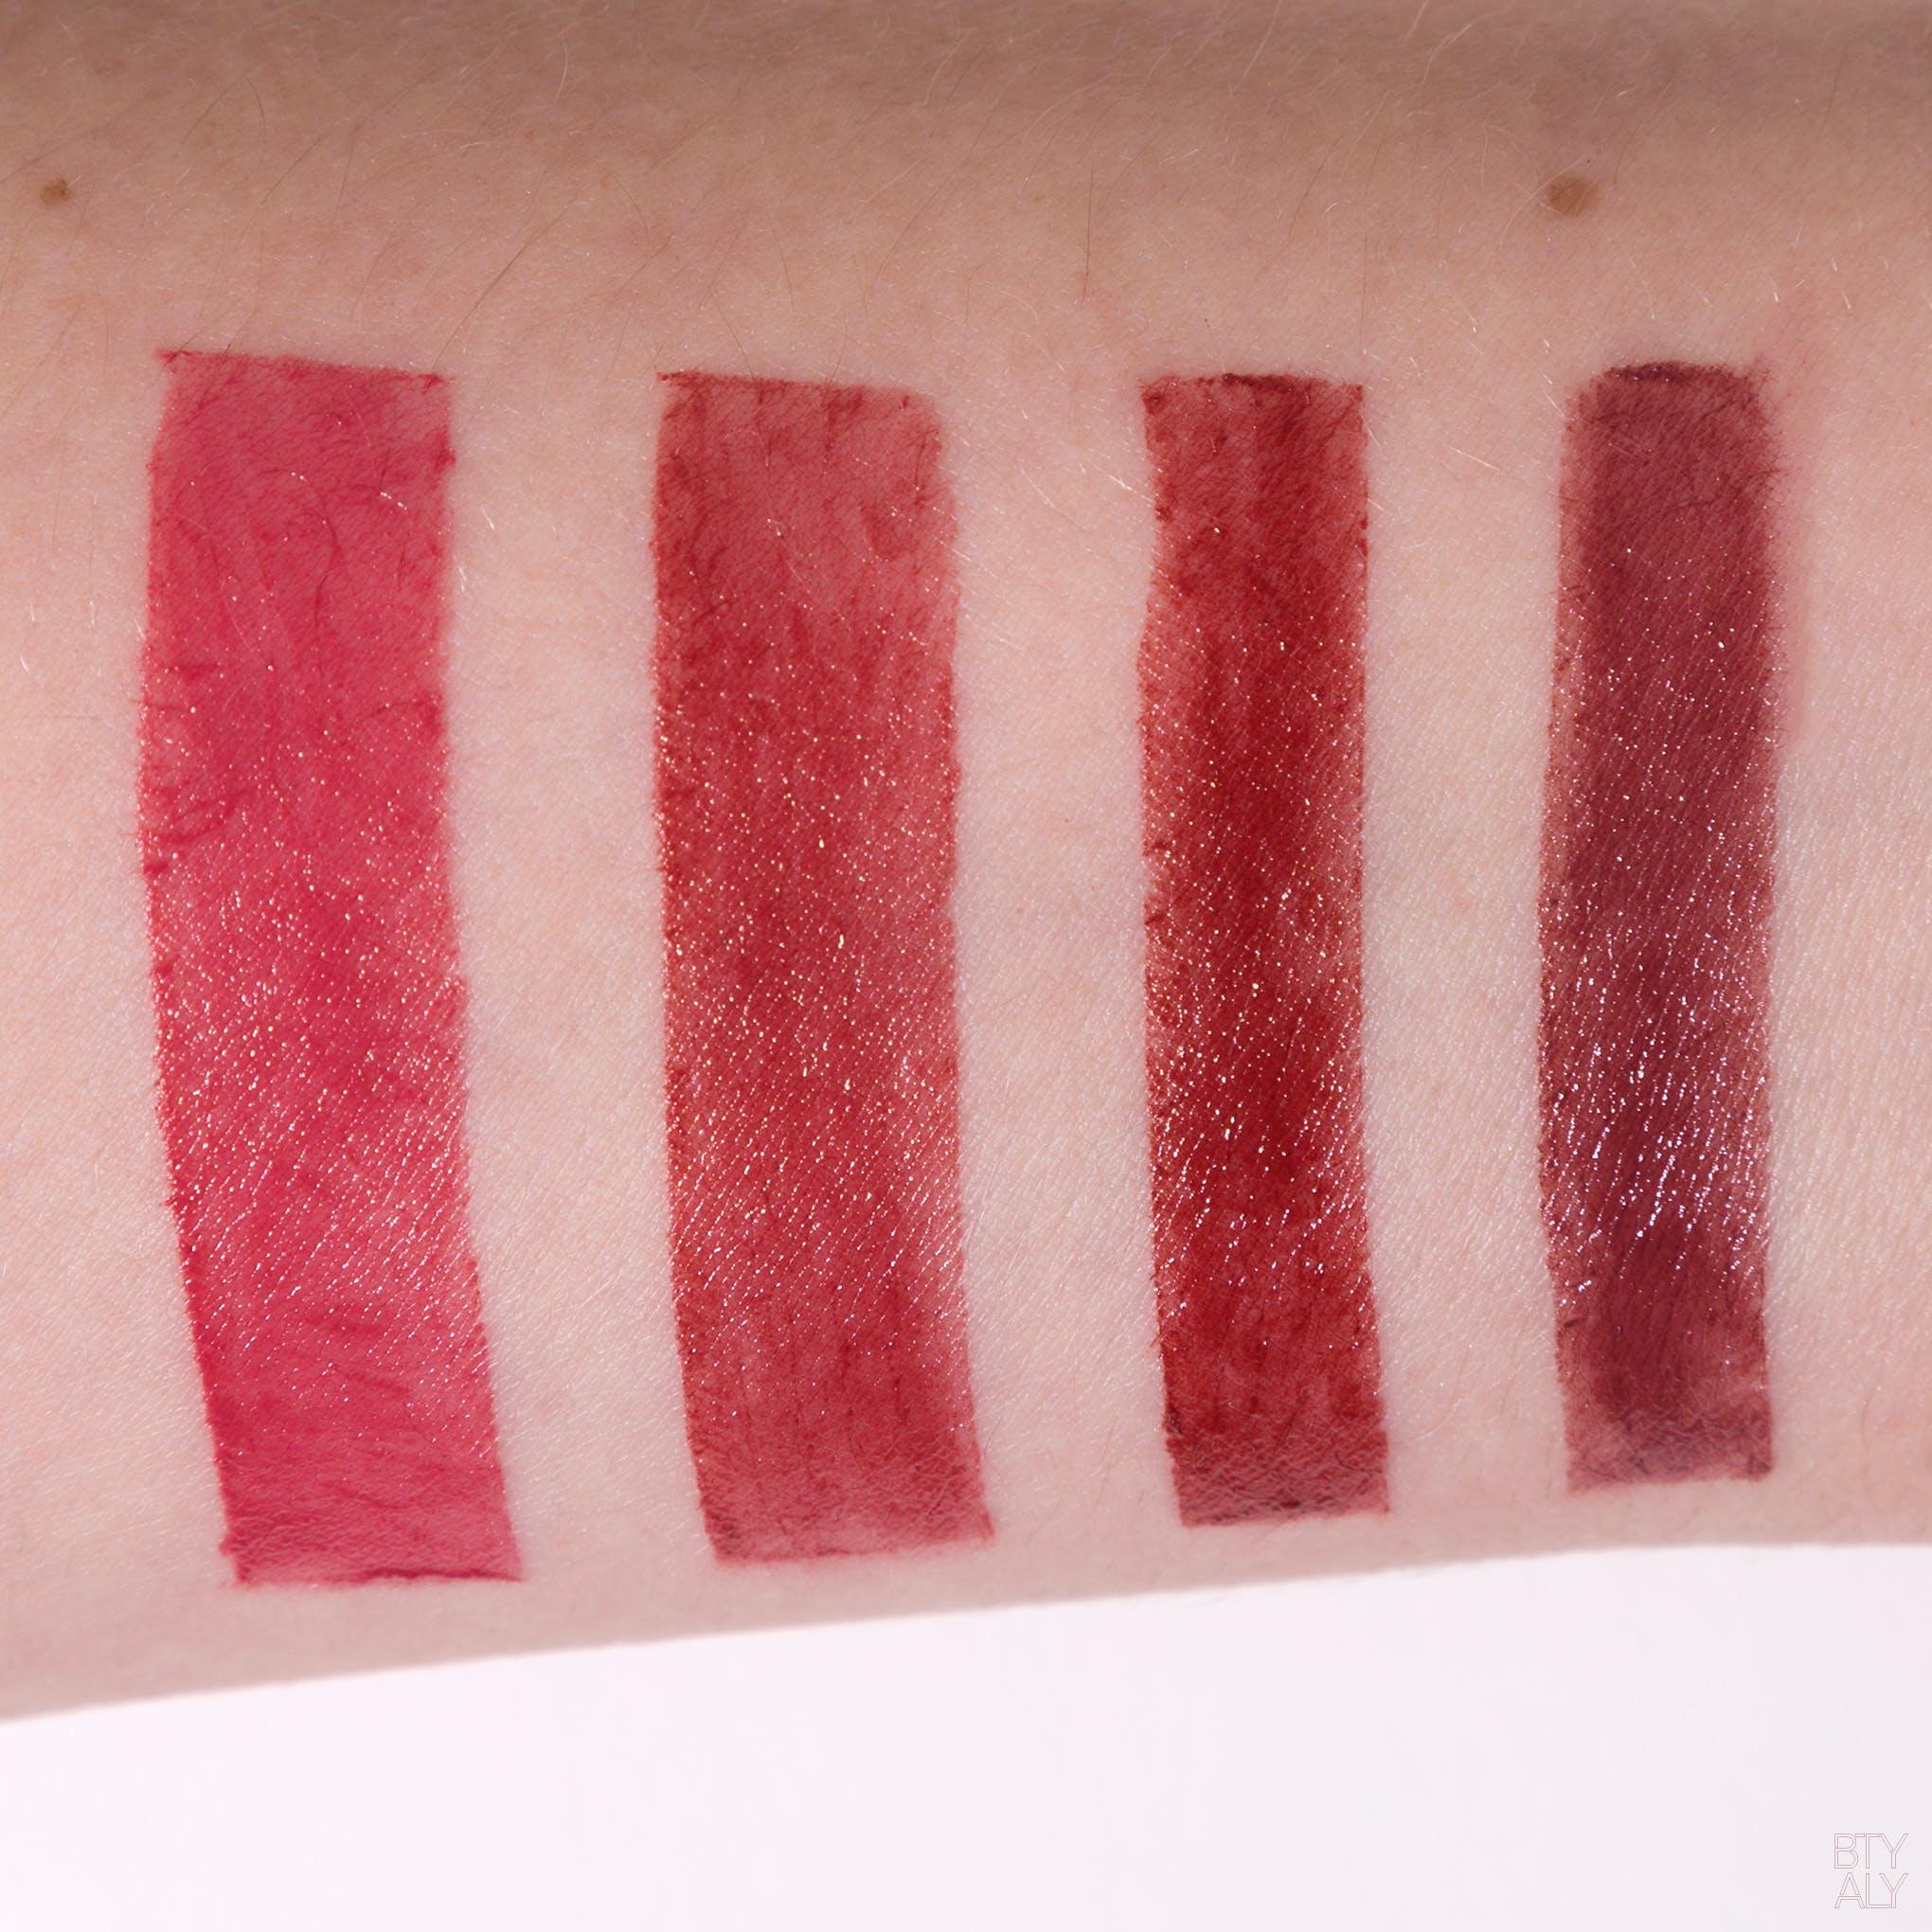 Bobbi Brown Crushed Lip Color: Babe, Plum, Cranberry, Telluride